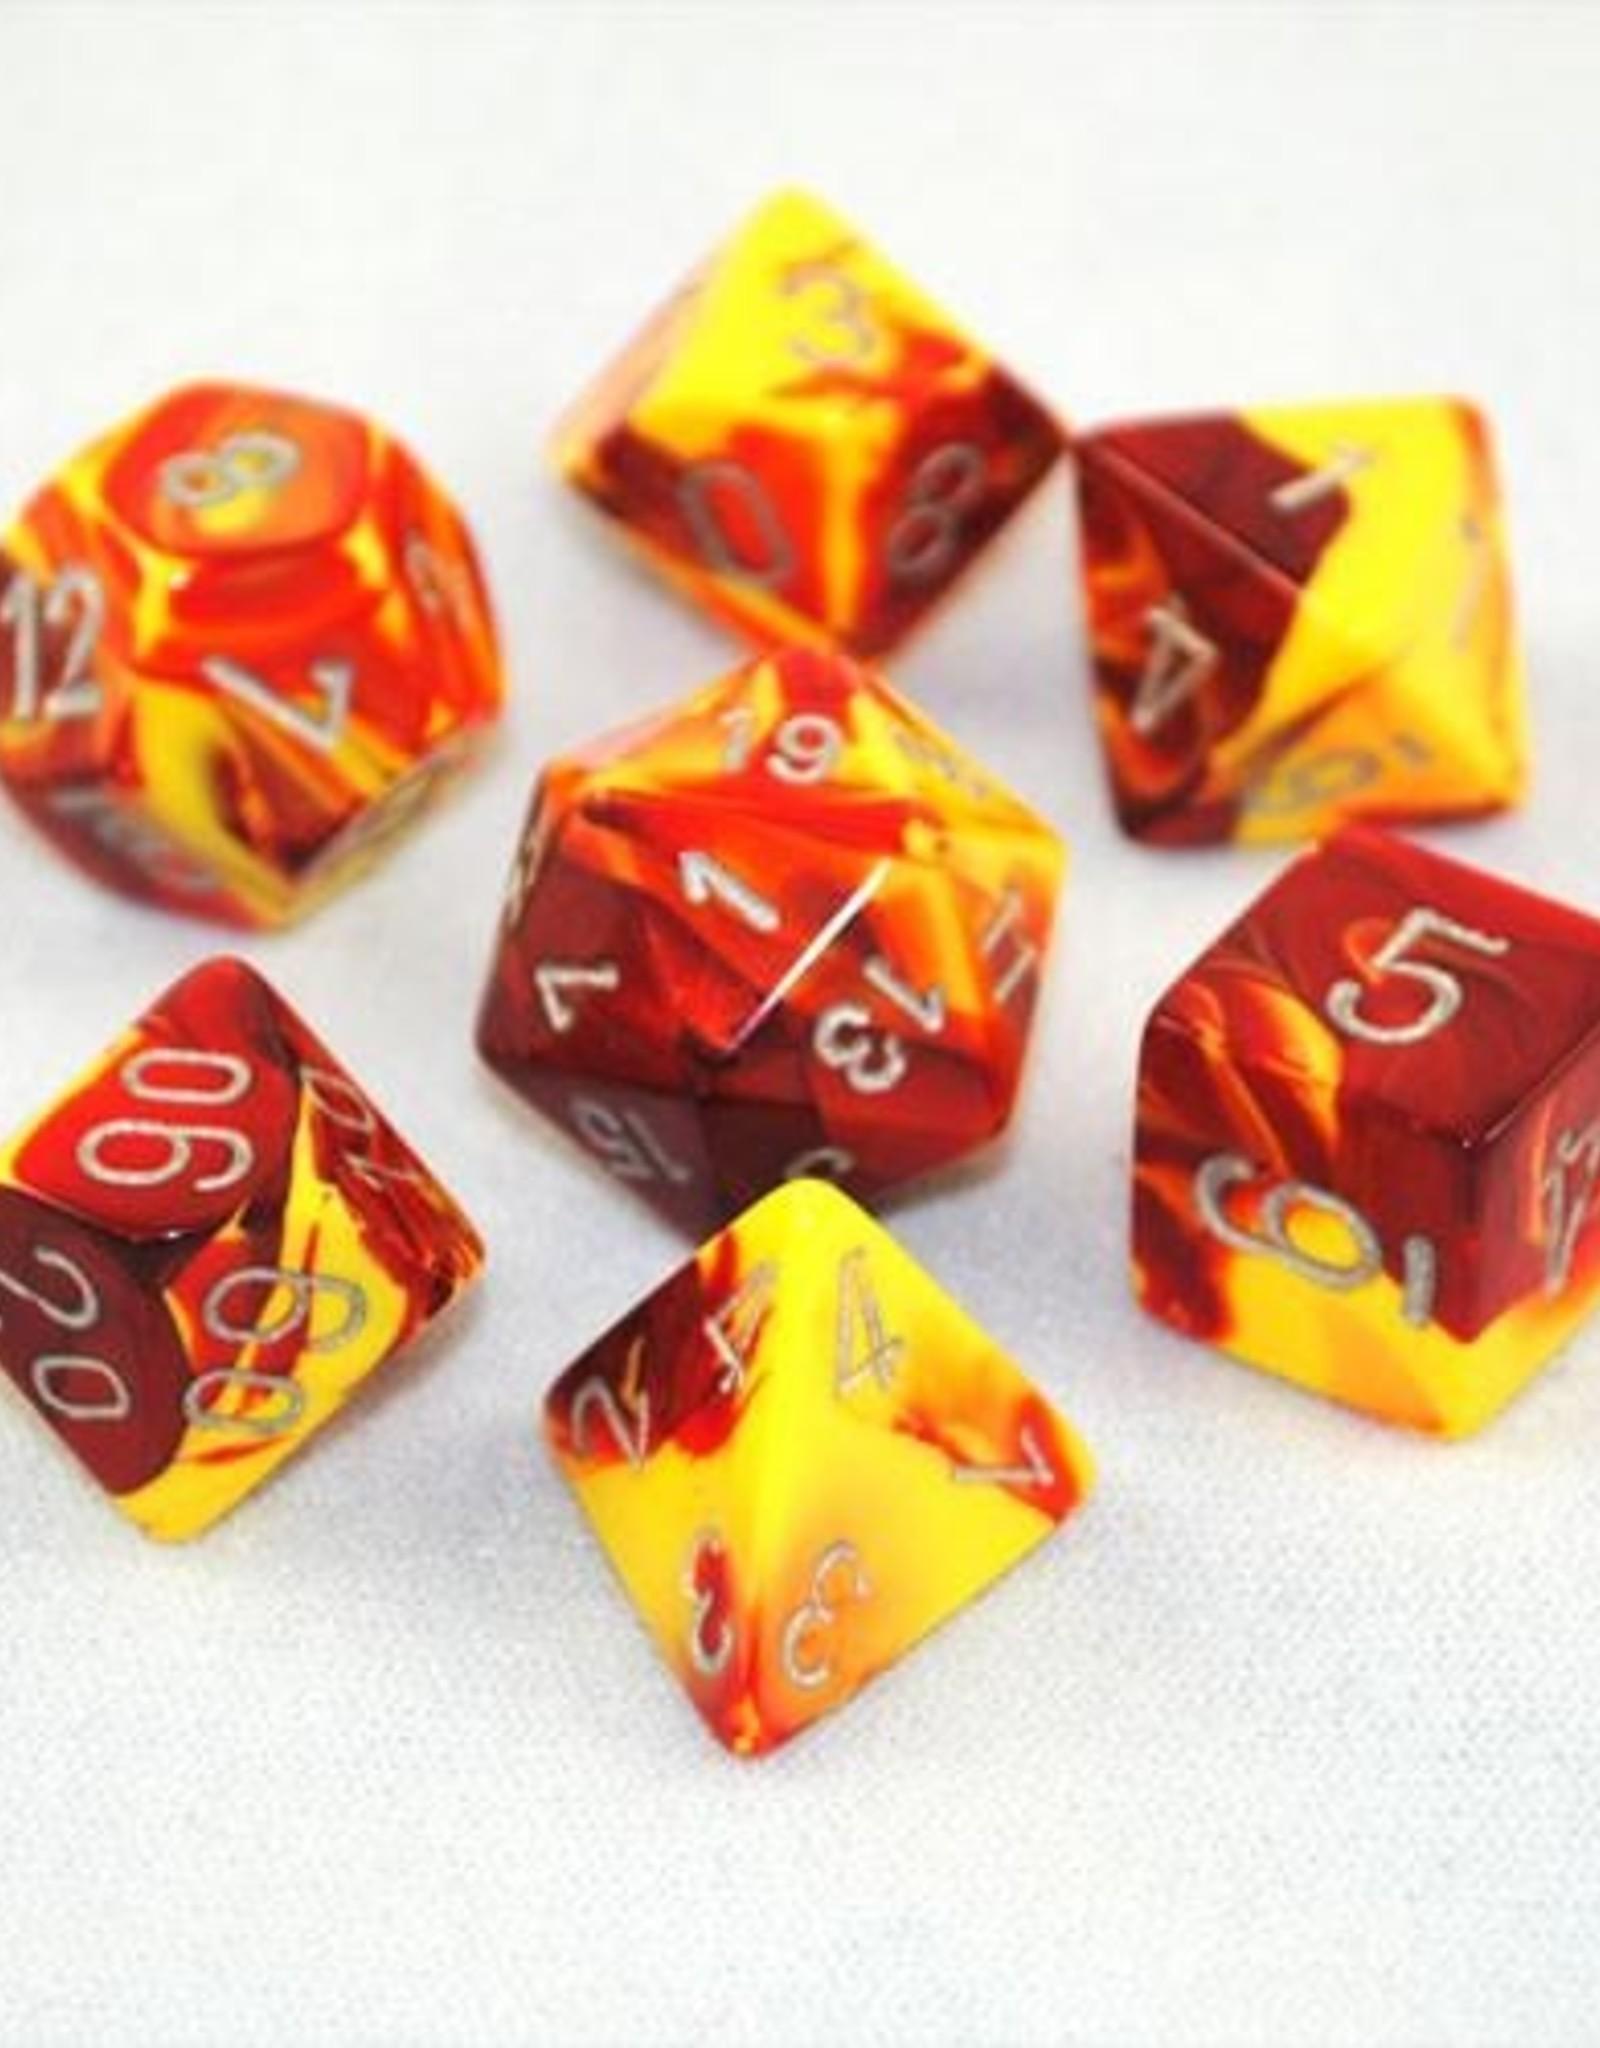 Chessex Chessex 7-Die set Gemini - Red-Yellow/Silver